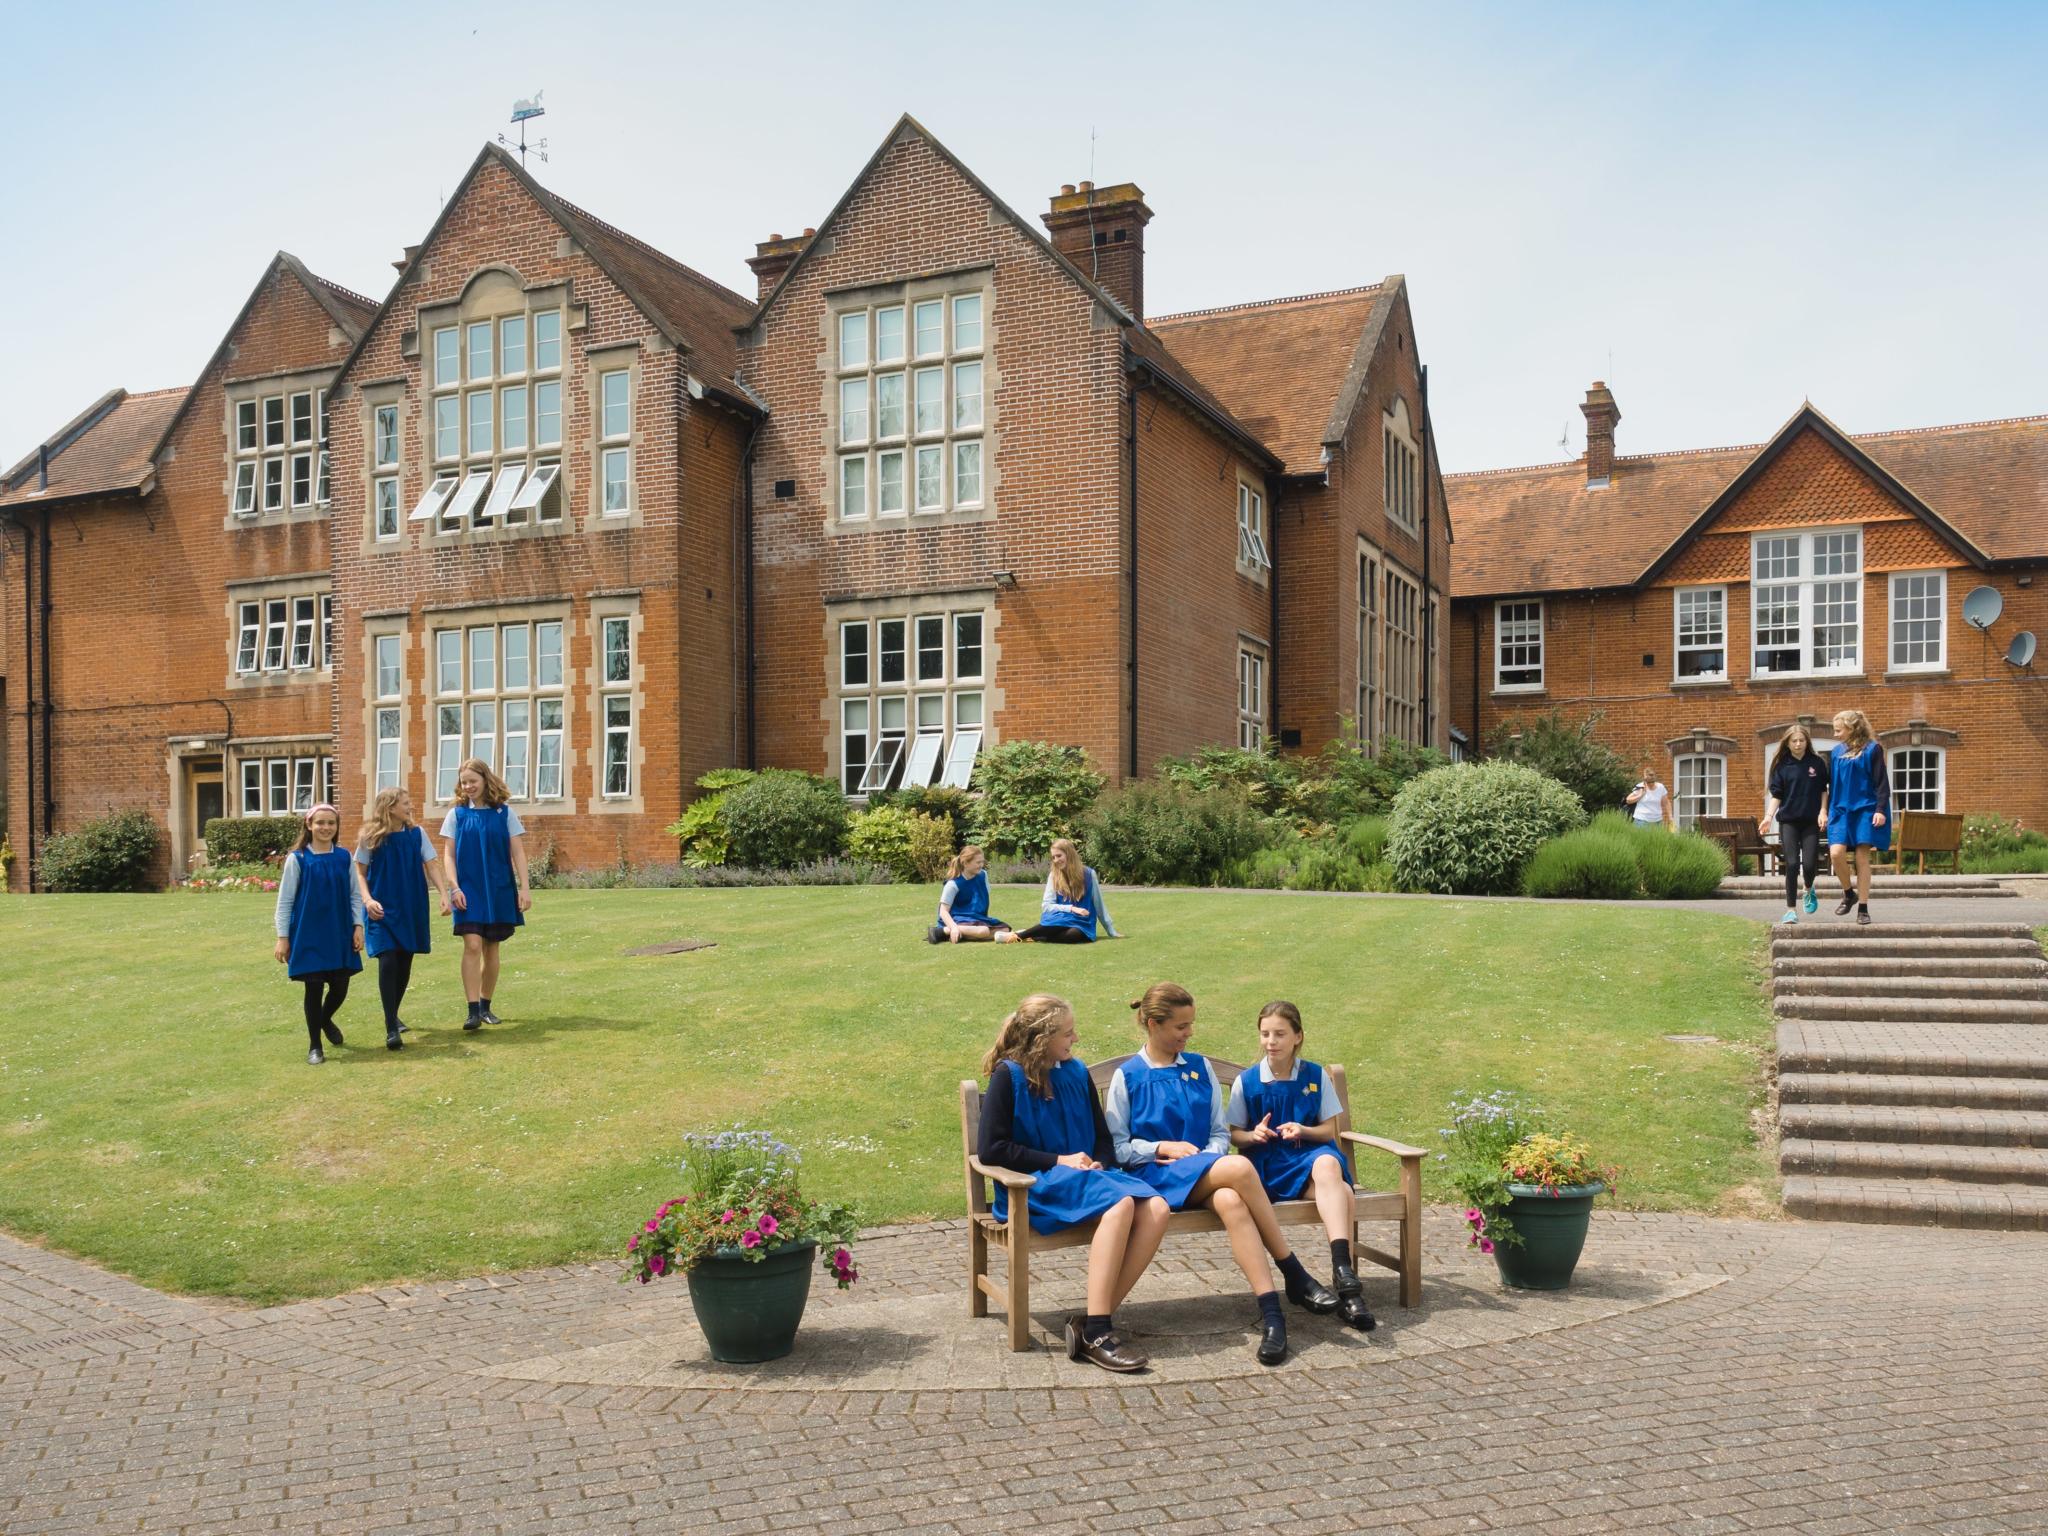 300 9Th June Godolphin School By Ash Mills